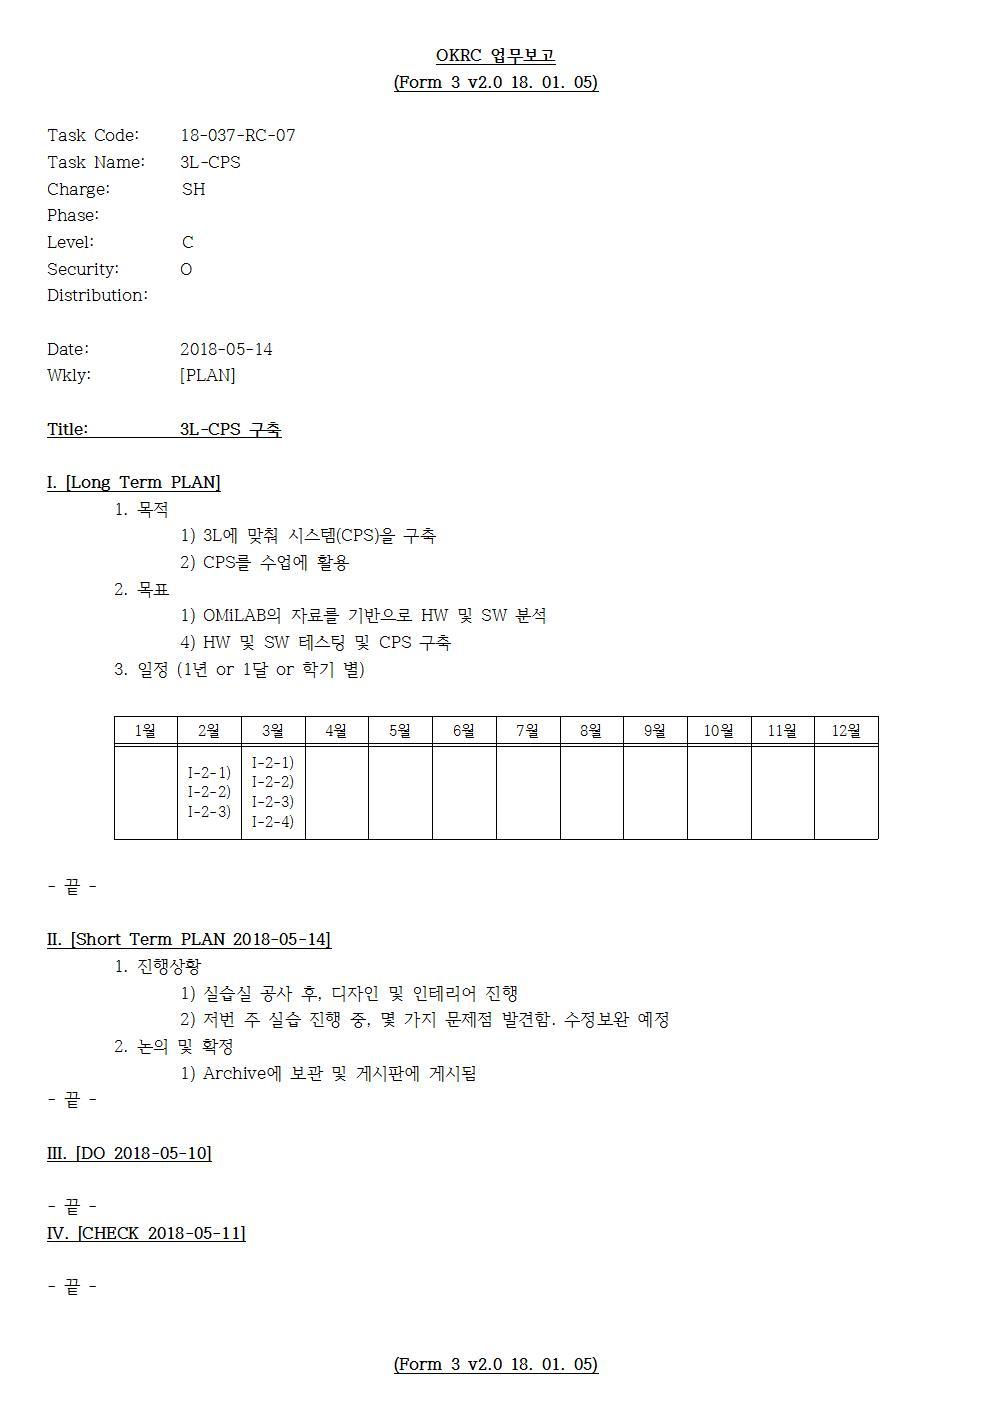 D-[18-037-RC-07]-[3L-CPS]-[2018-05-14][SH]001.jpg